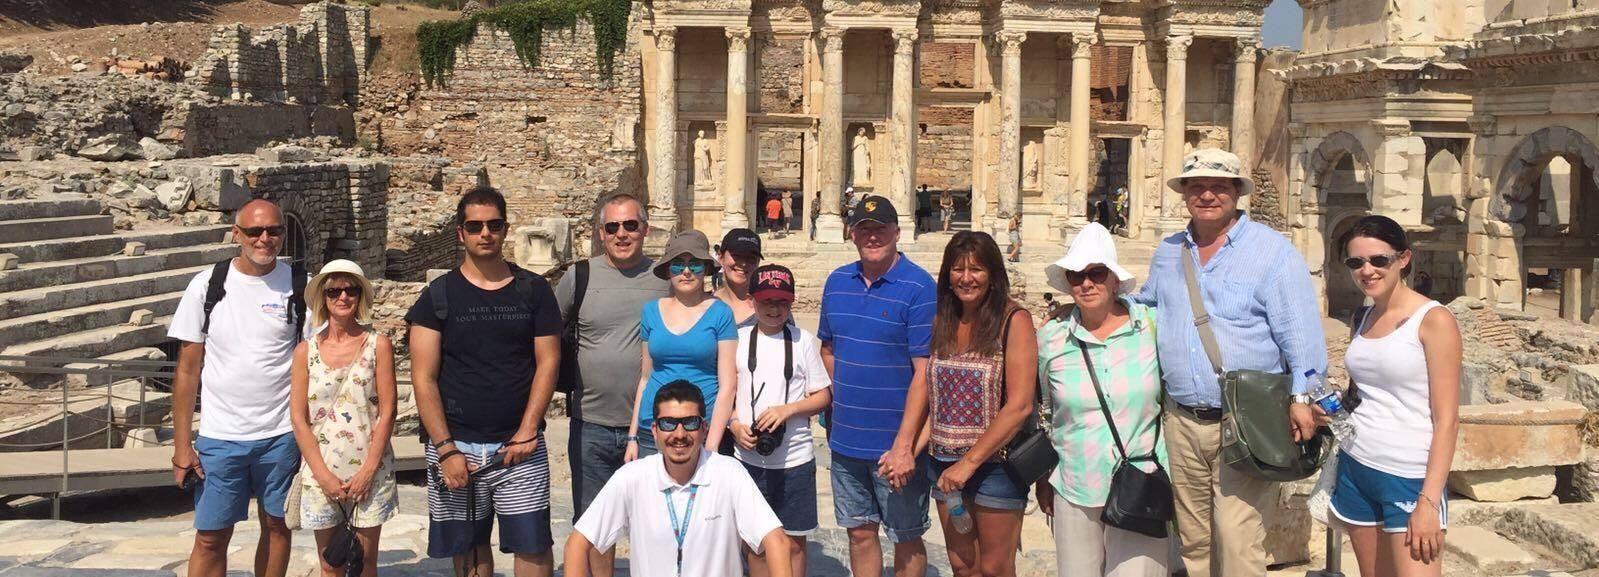 From Kusadasi: Full-Day Small Group Ephesus Tour